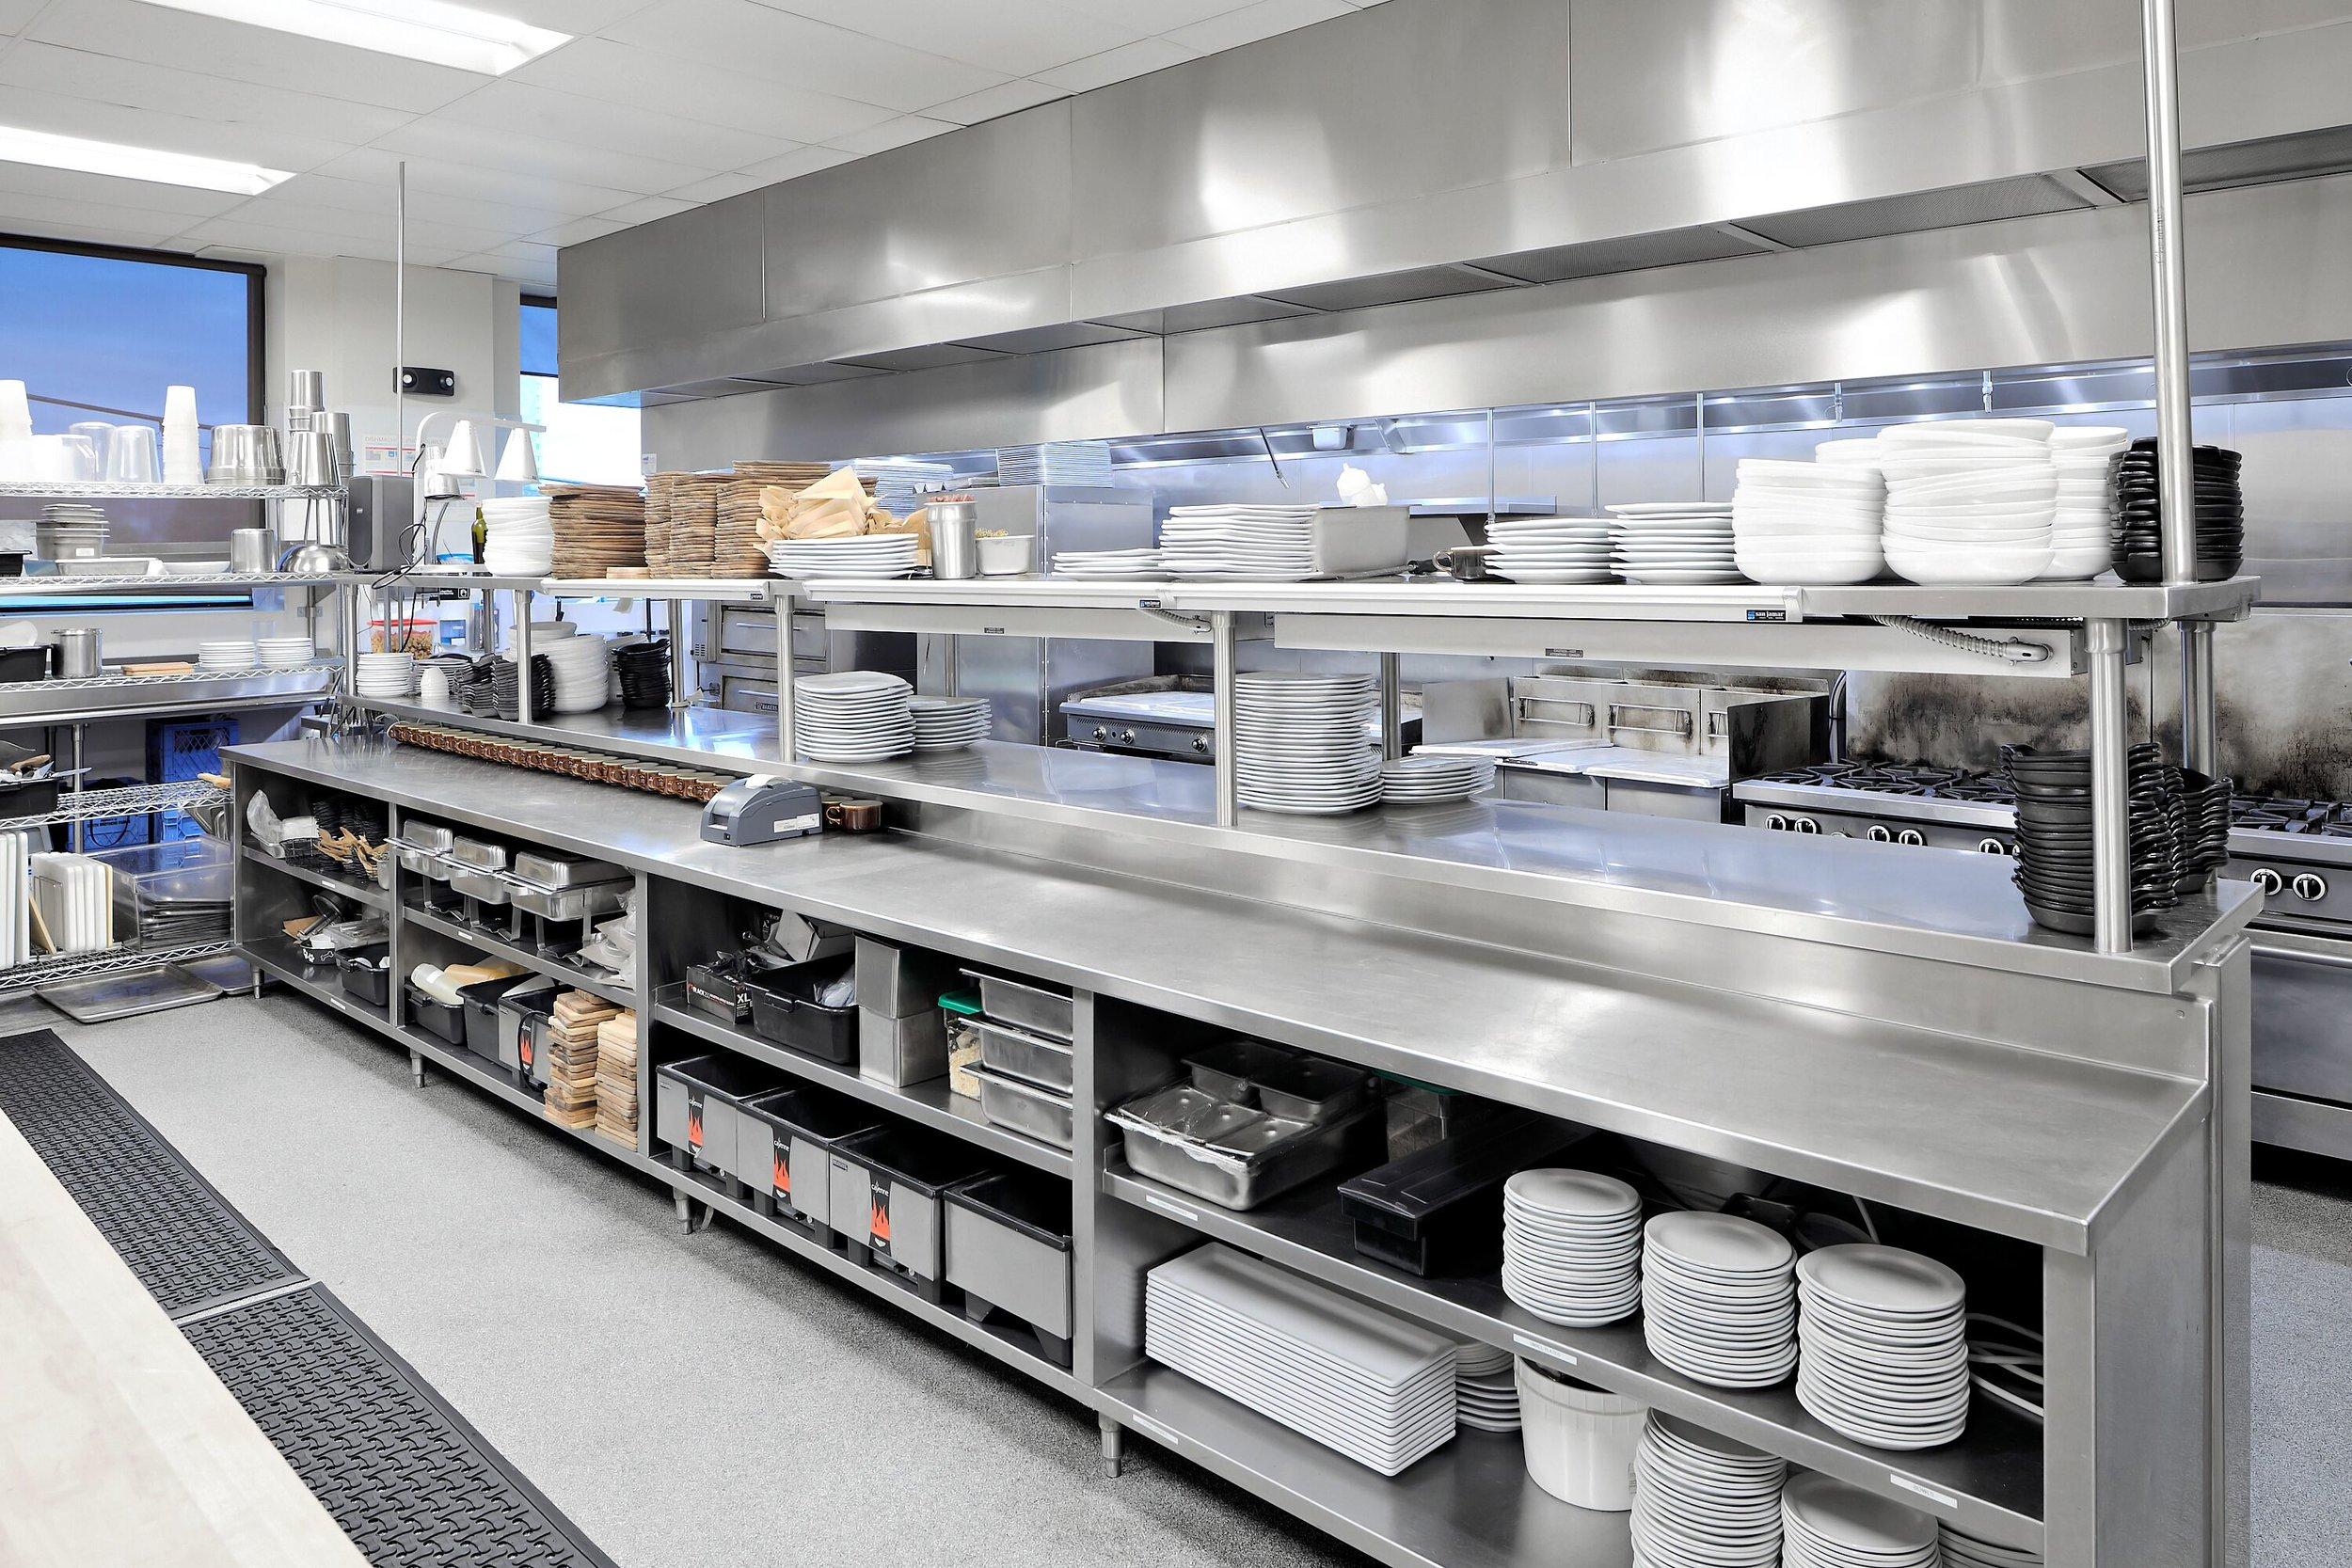 Kitchen Supplies and Equipment